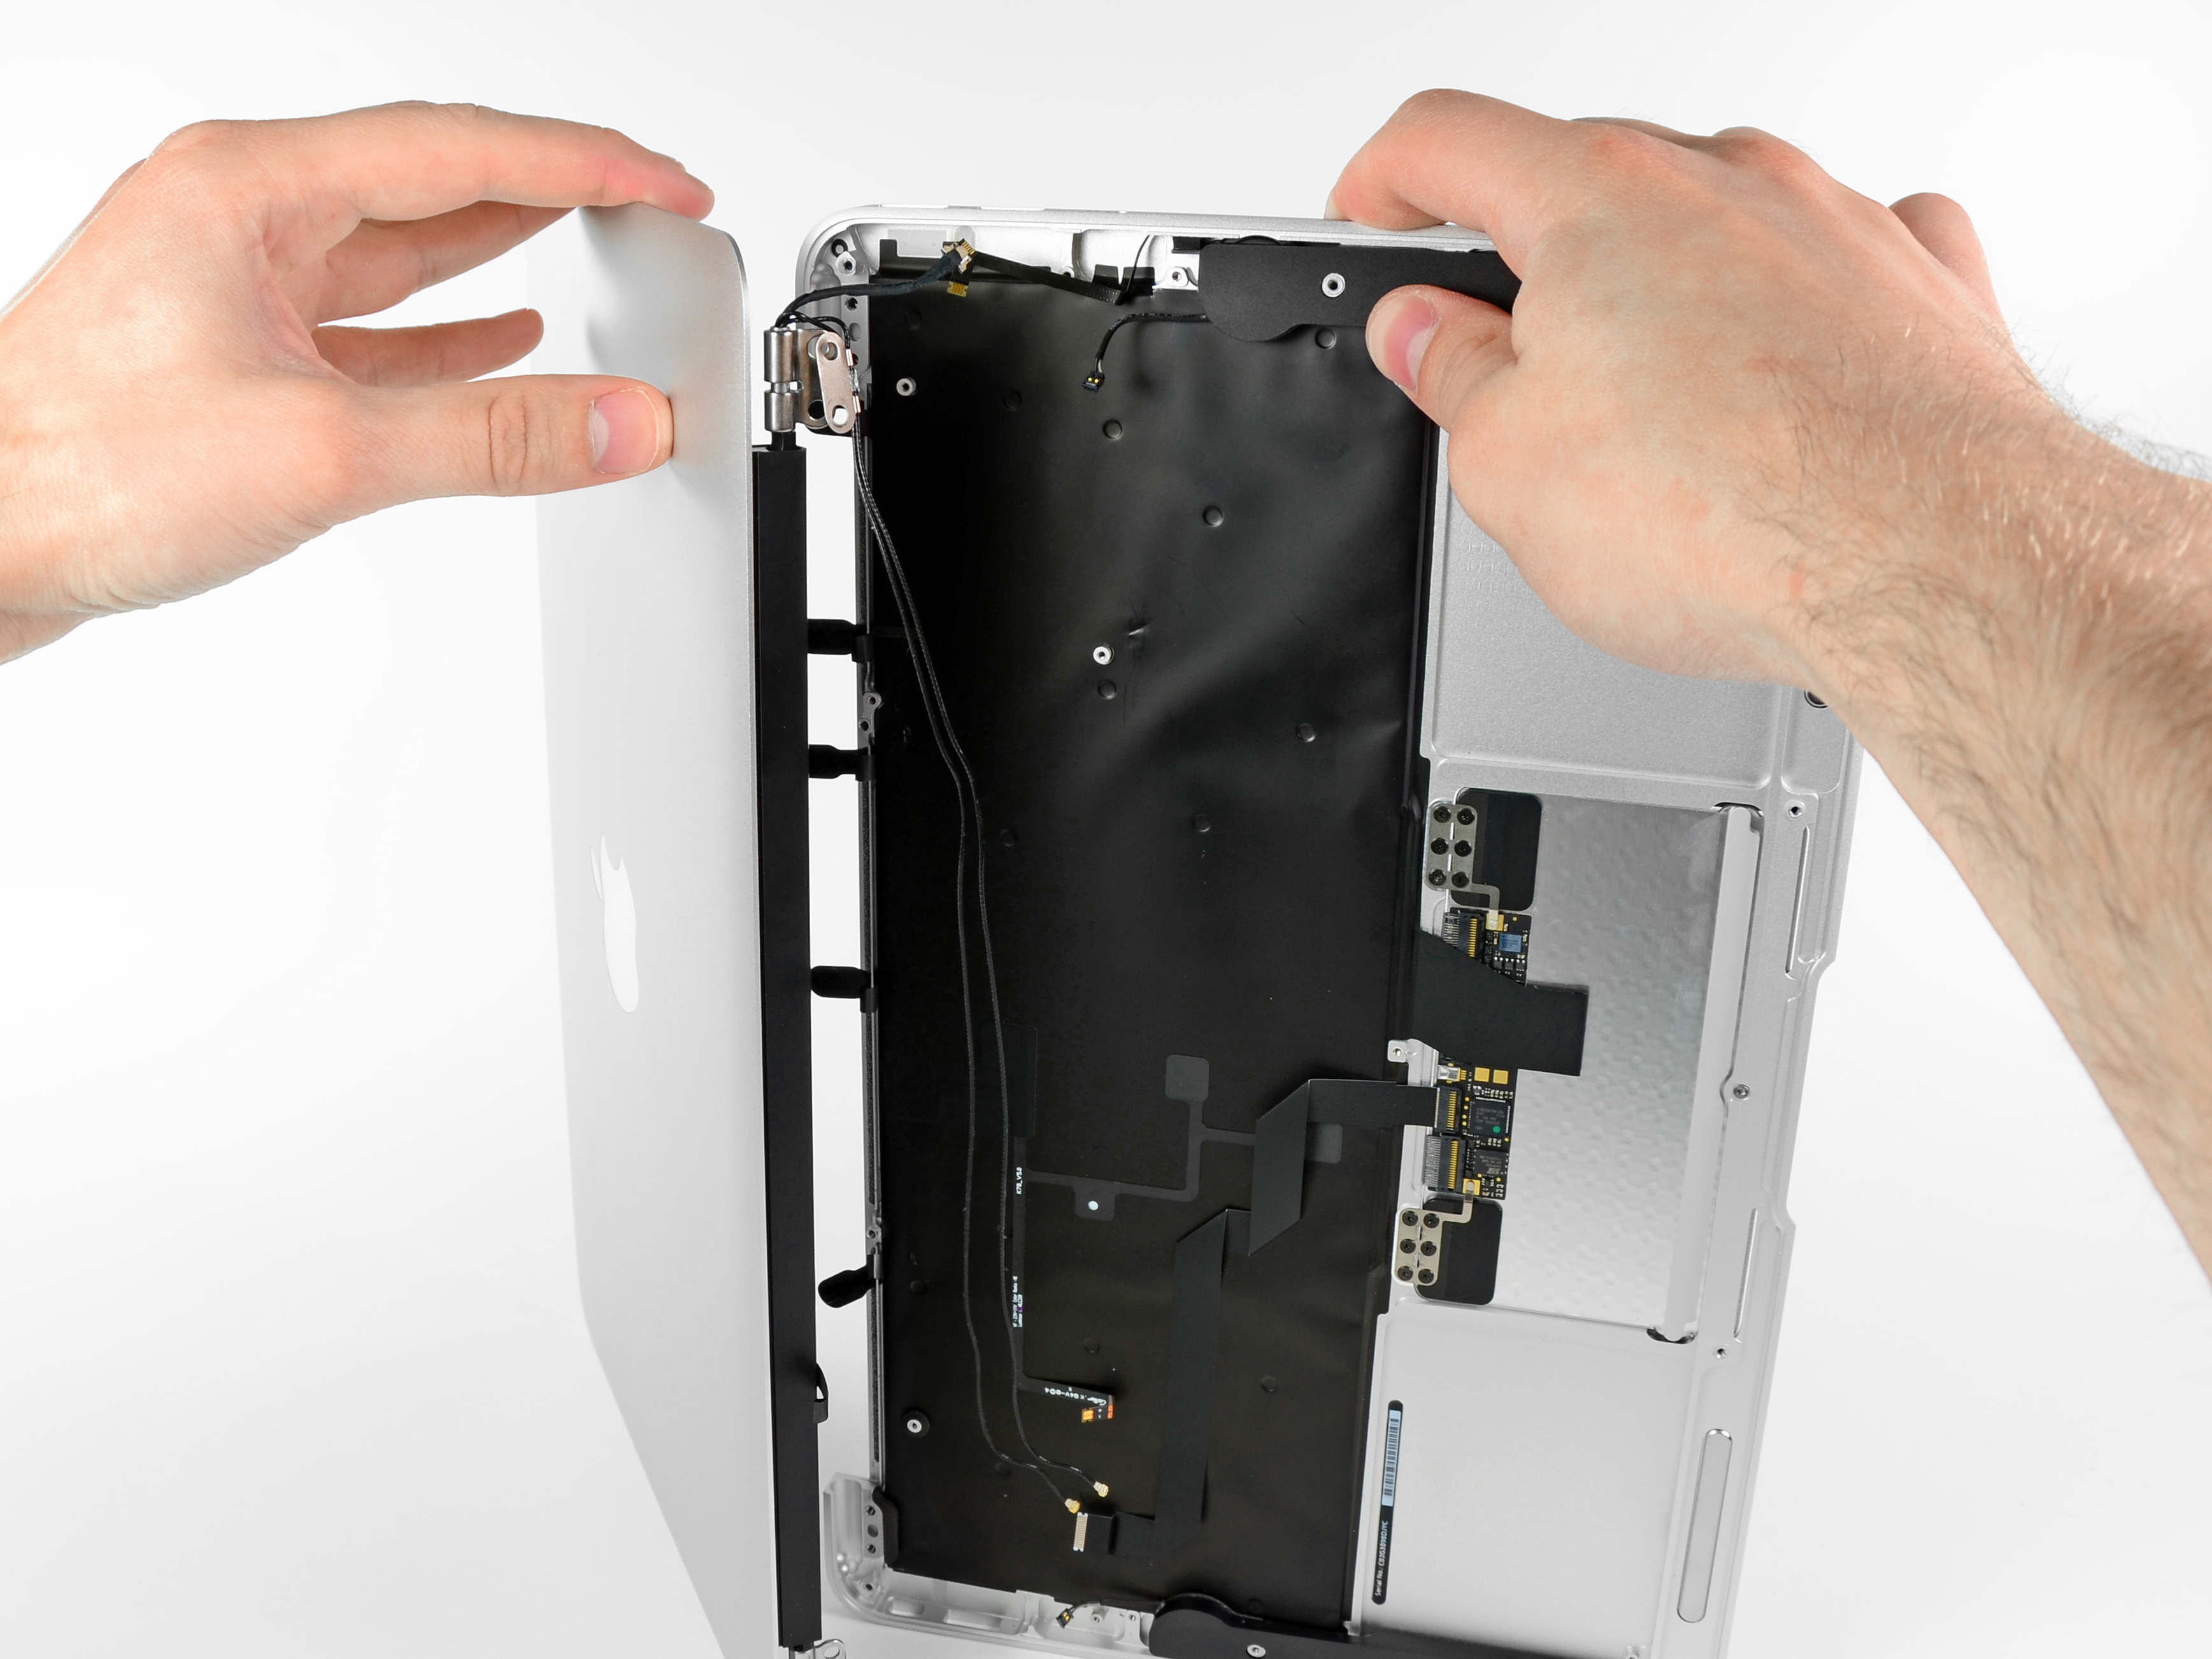 macbook air 11 mid 2011 repair ifixit rh ifixit com manual for macbook late 2009 manual for macbook pro